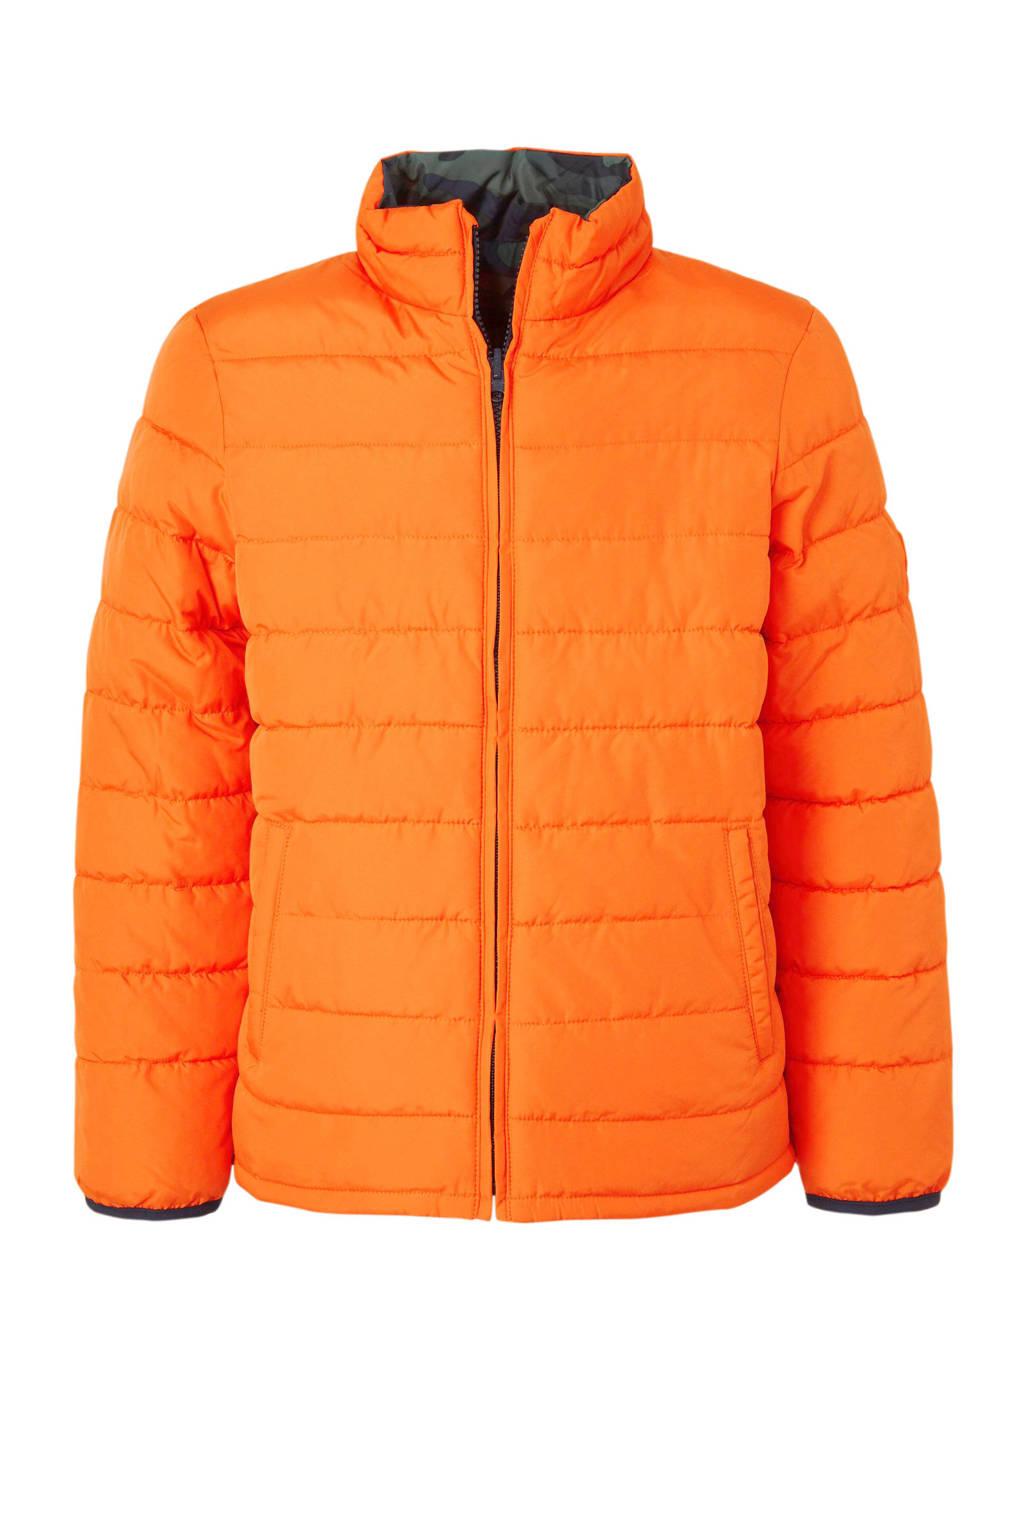 GAP omkeerbare winterjas met camouflageprint oranje/groen, Oranje/groen